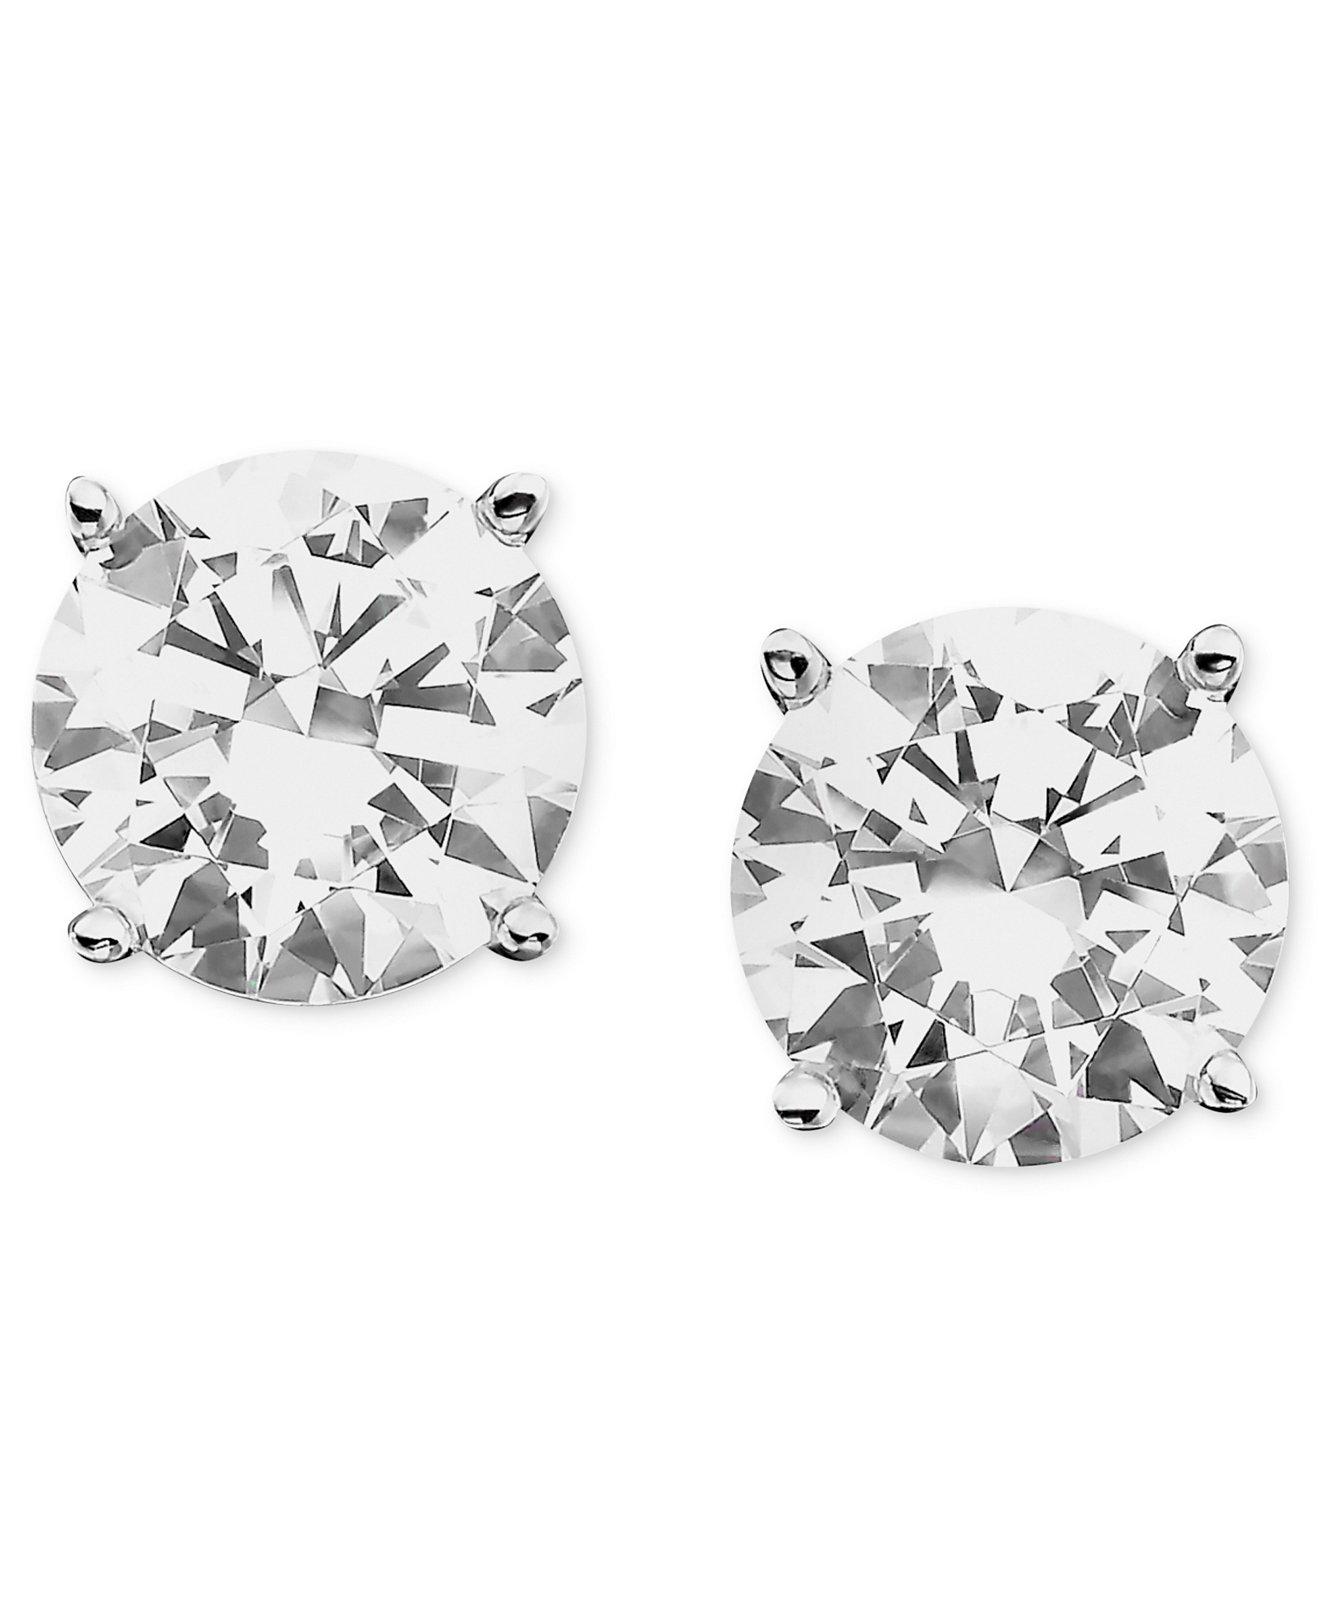 Certified Colorless Diamond Stud Earrings In 18k White Gold  Earrings   Jewelry & Watches  Macy's